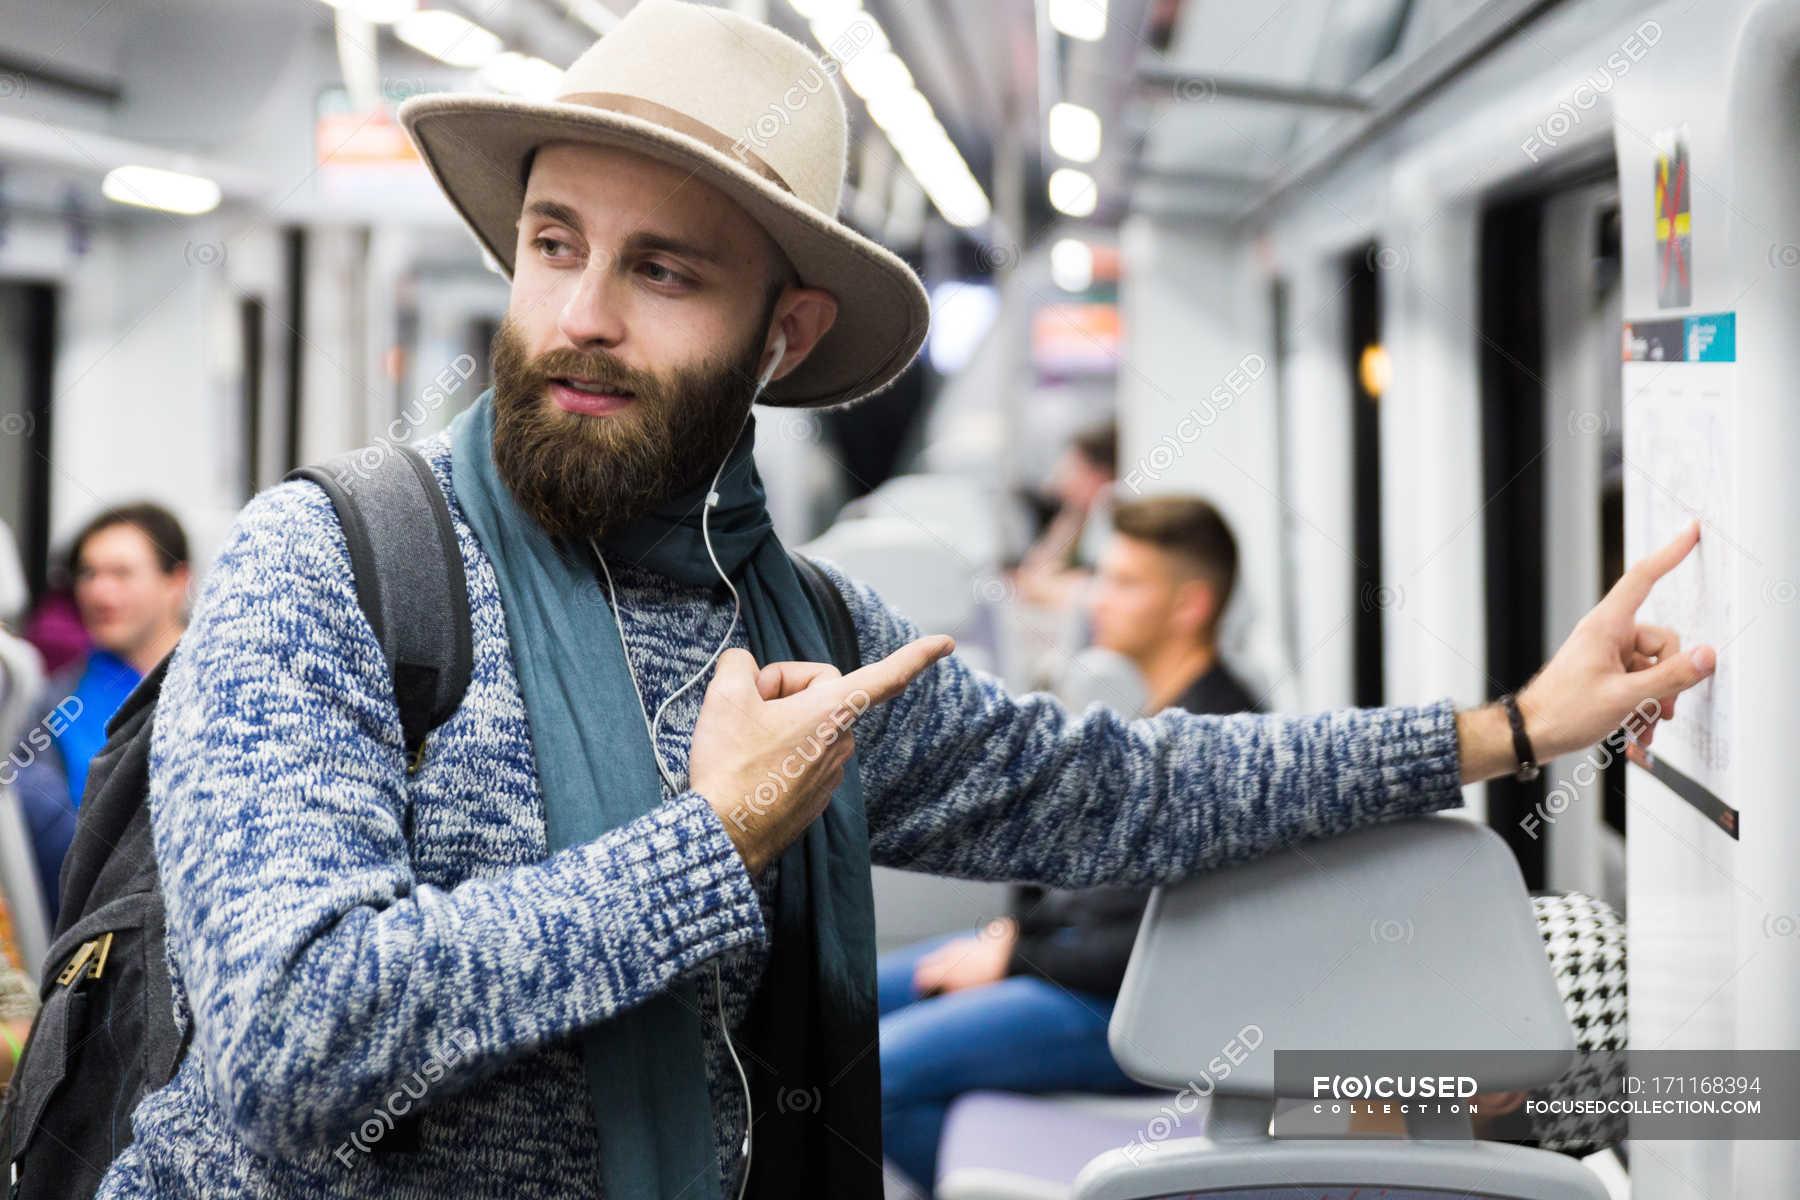 Man Looking At Subway Map.Tourist In Wagon Pointing At Subway Map And Looking Away With